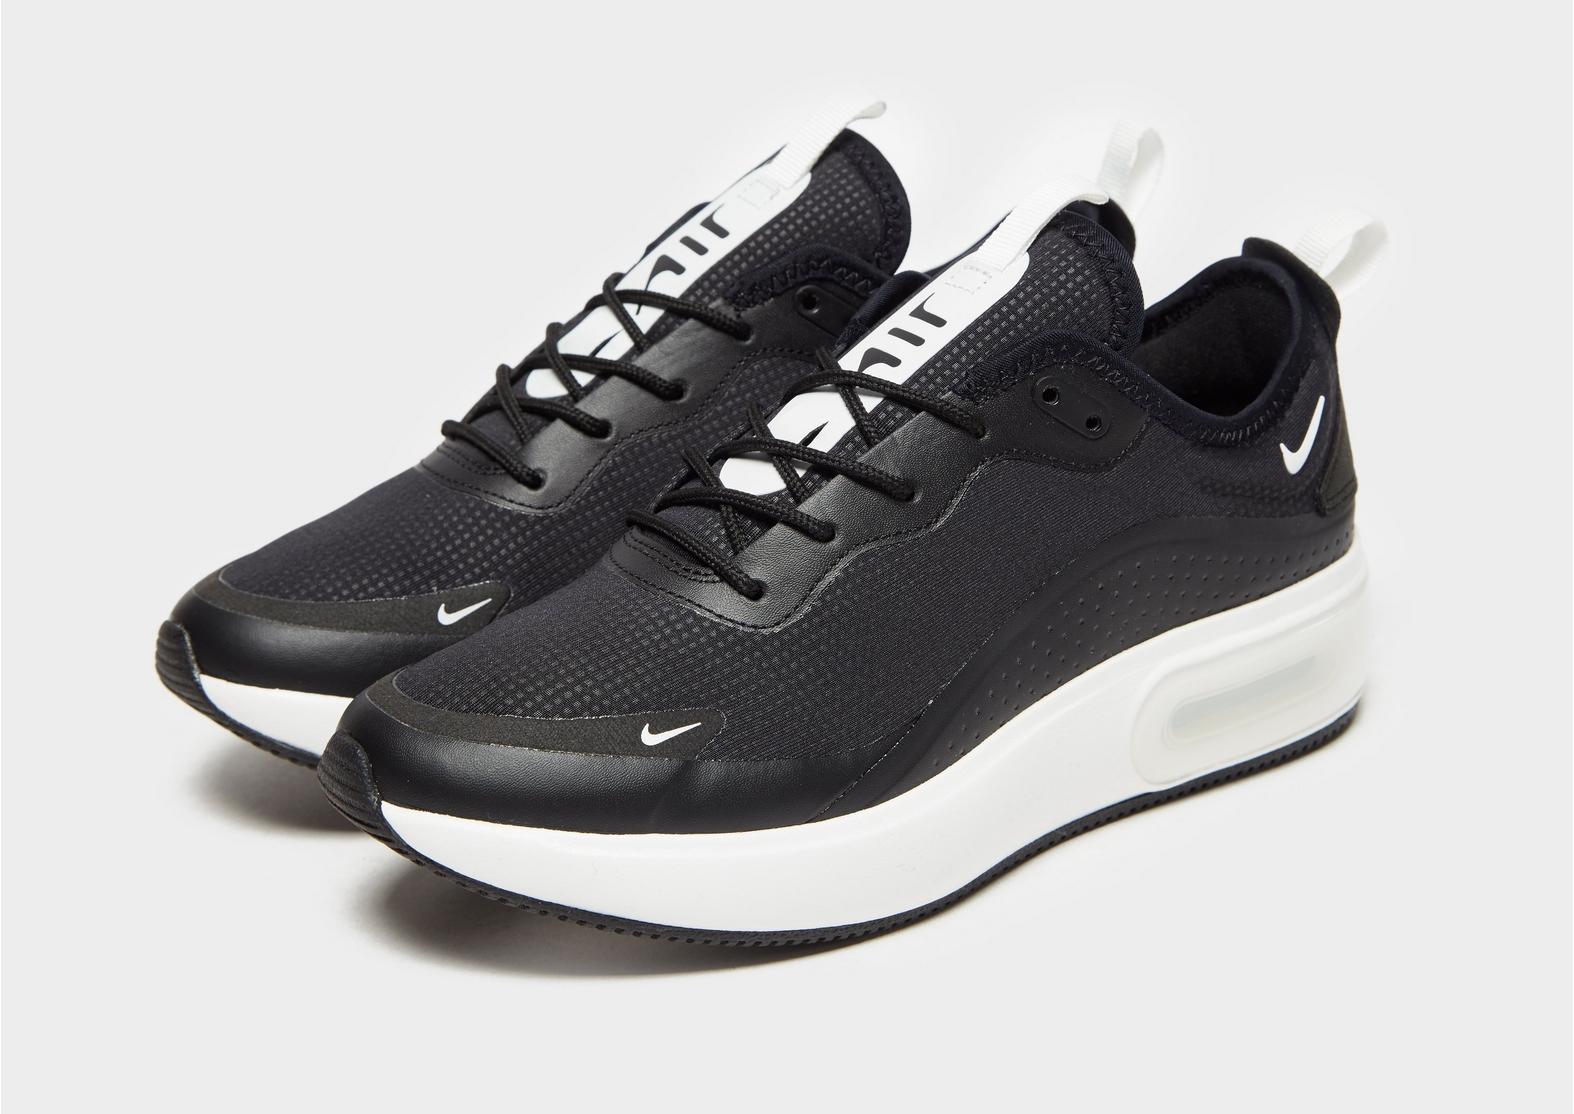 JD Sports Exclusive Nike Air Max 90 in Black & Grey